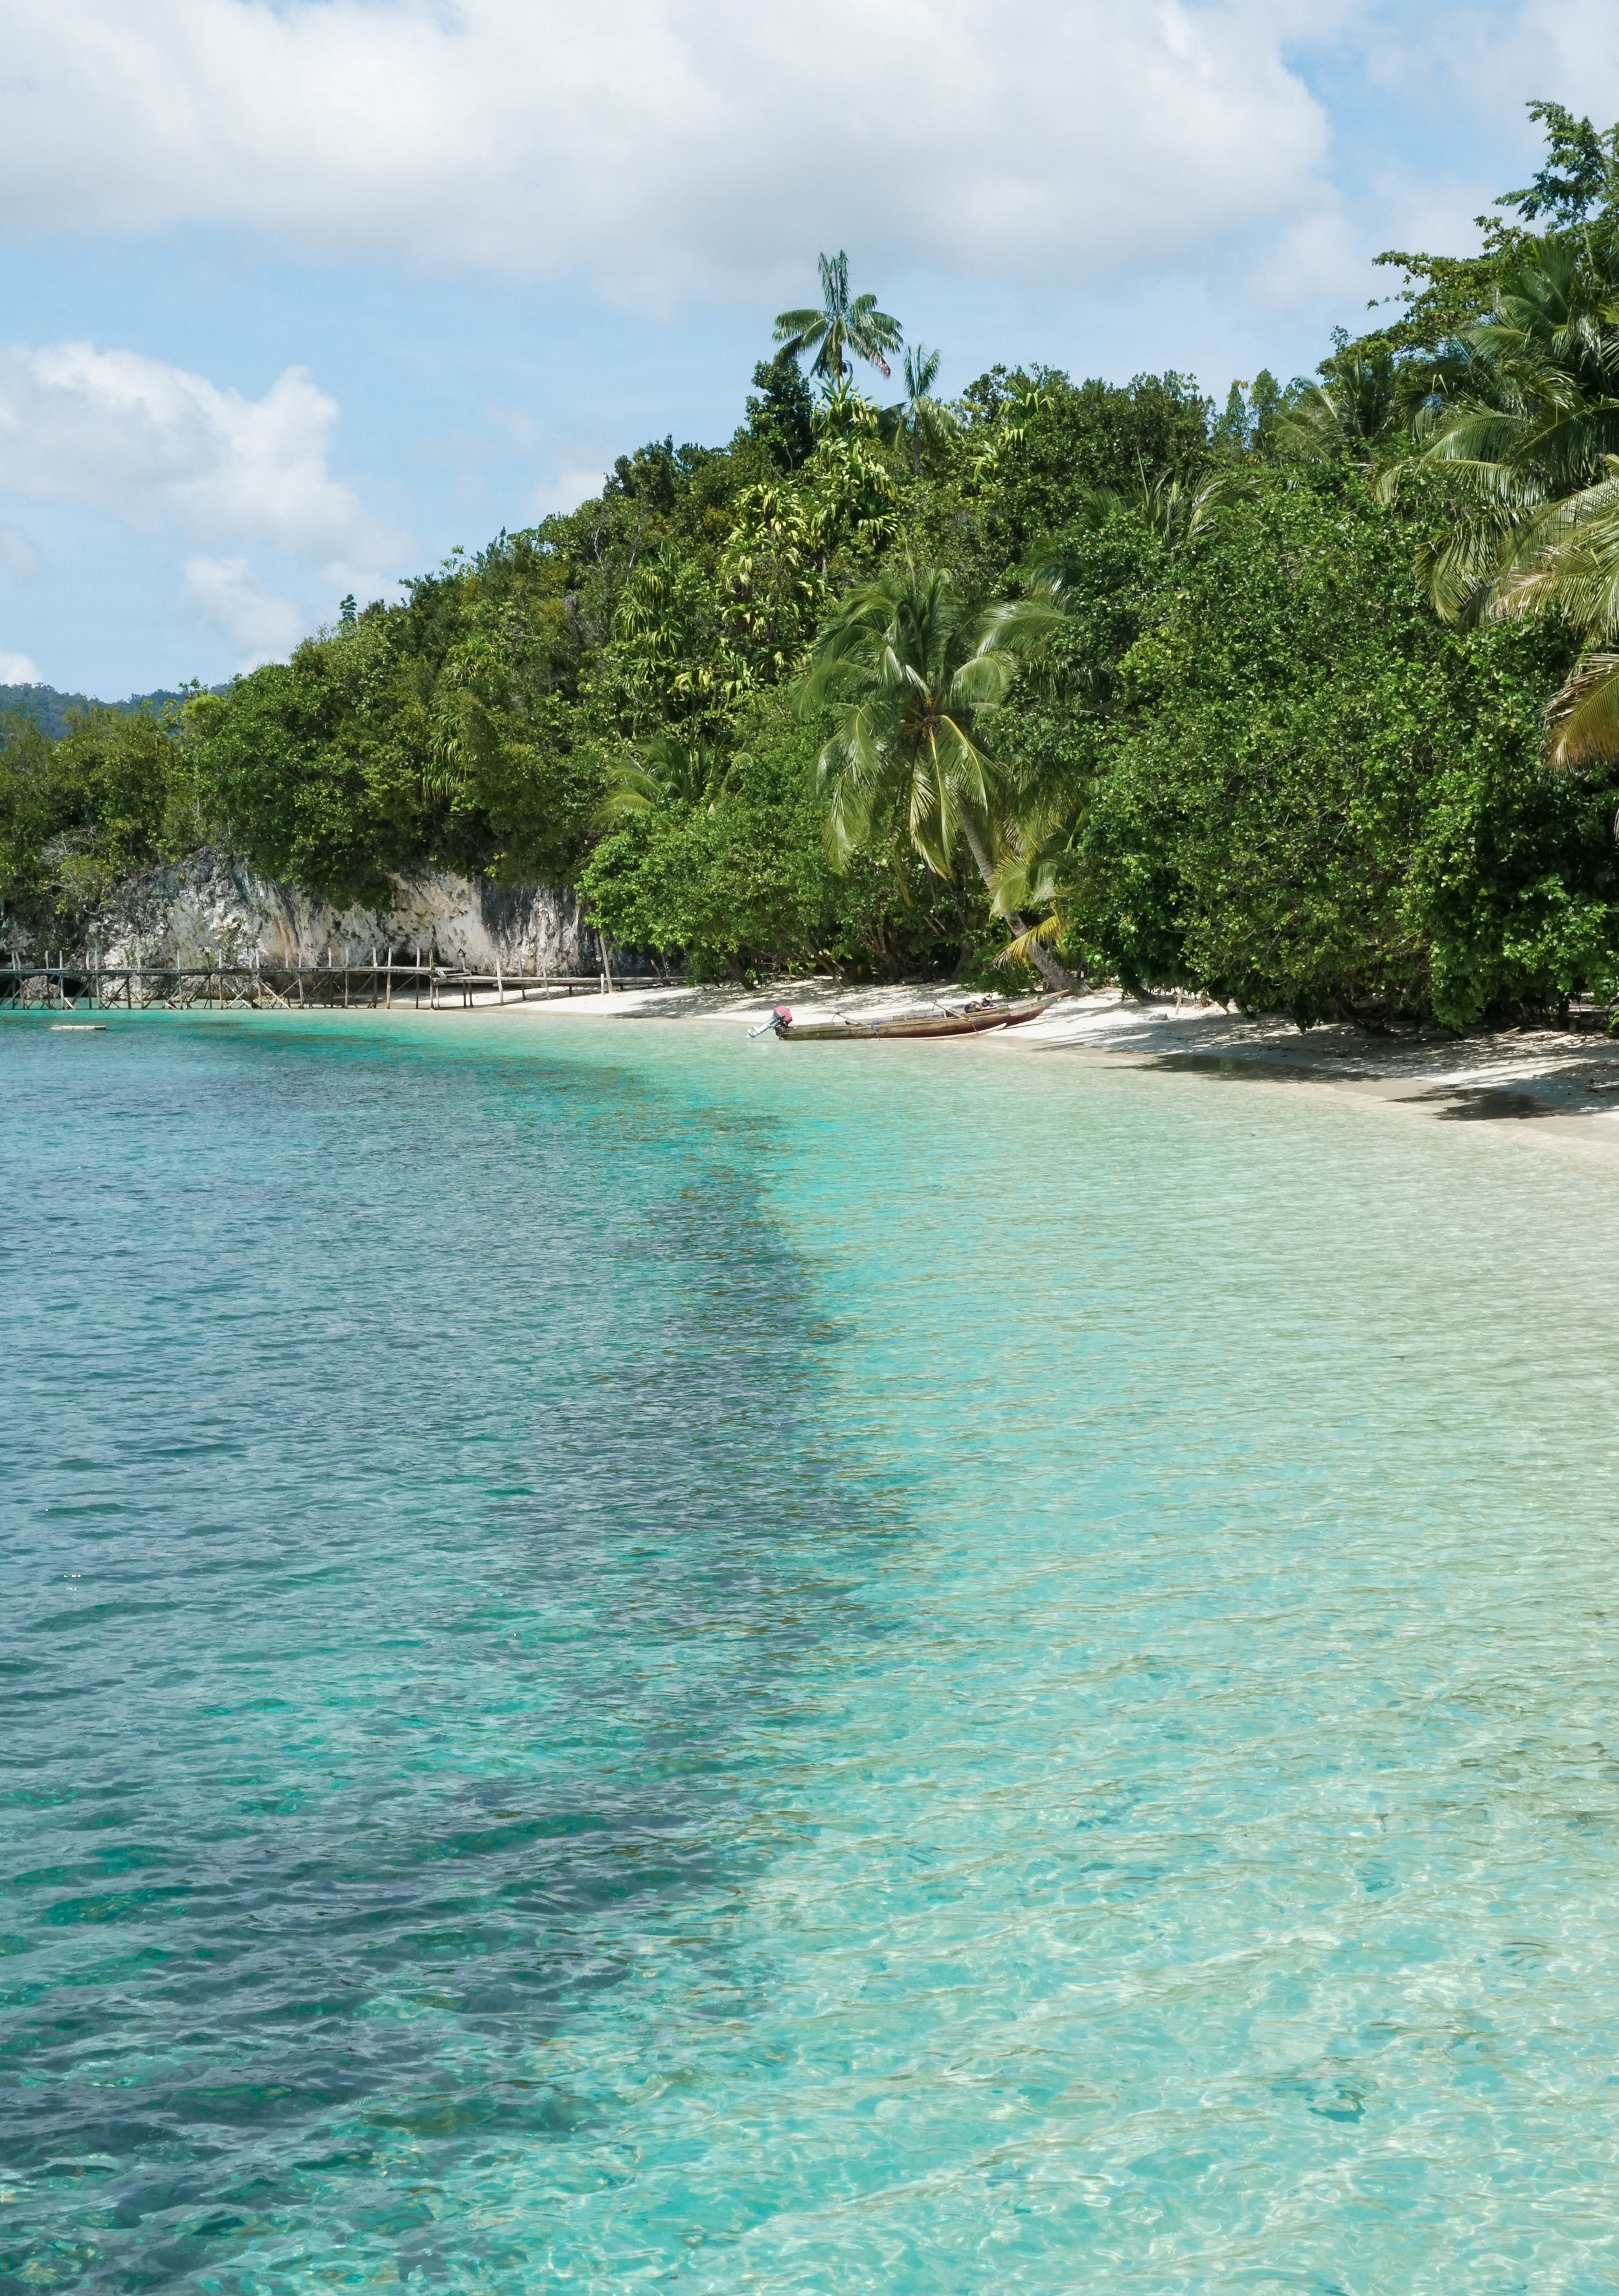 curio.trips.indonesia.raja.ampat.private.island.beach.boat.portrait.jpg